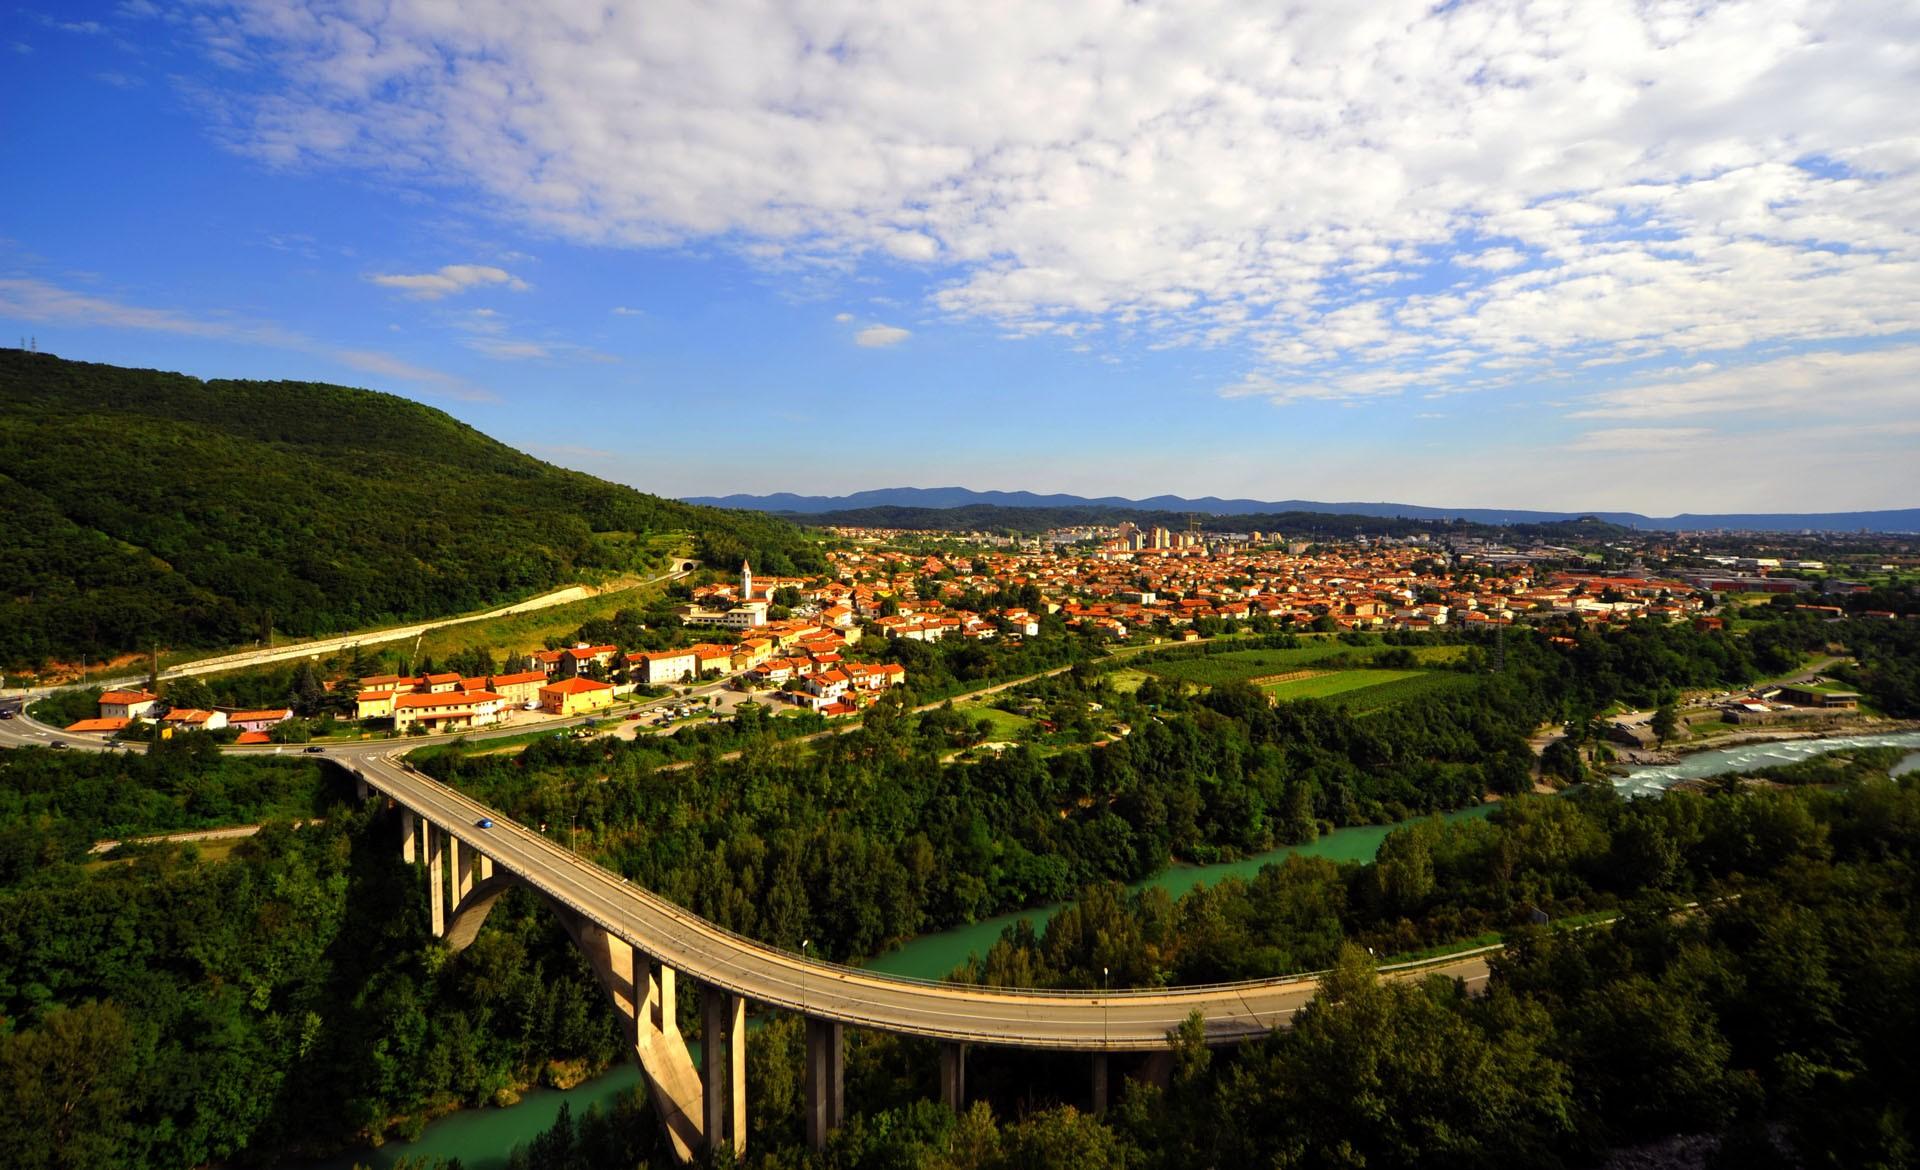 Die Stadt Nova Gorica